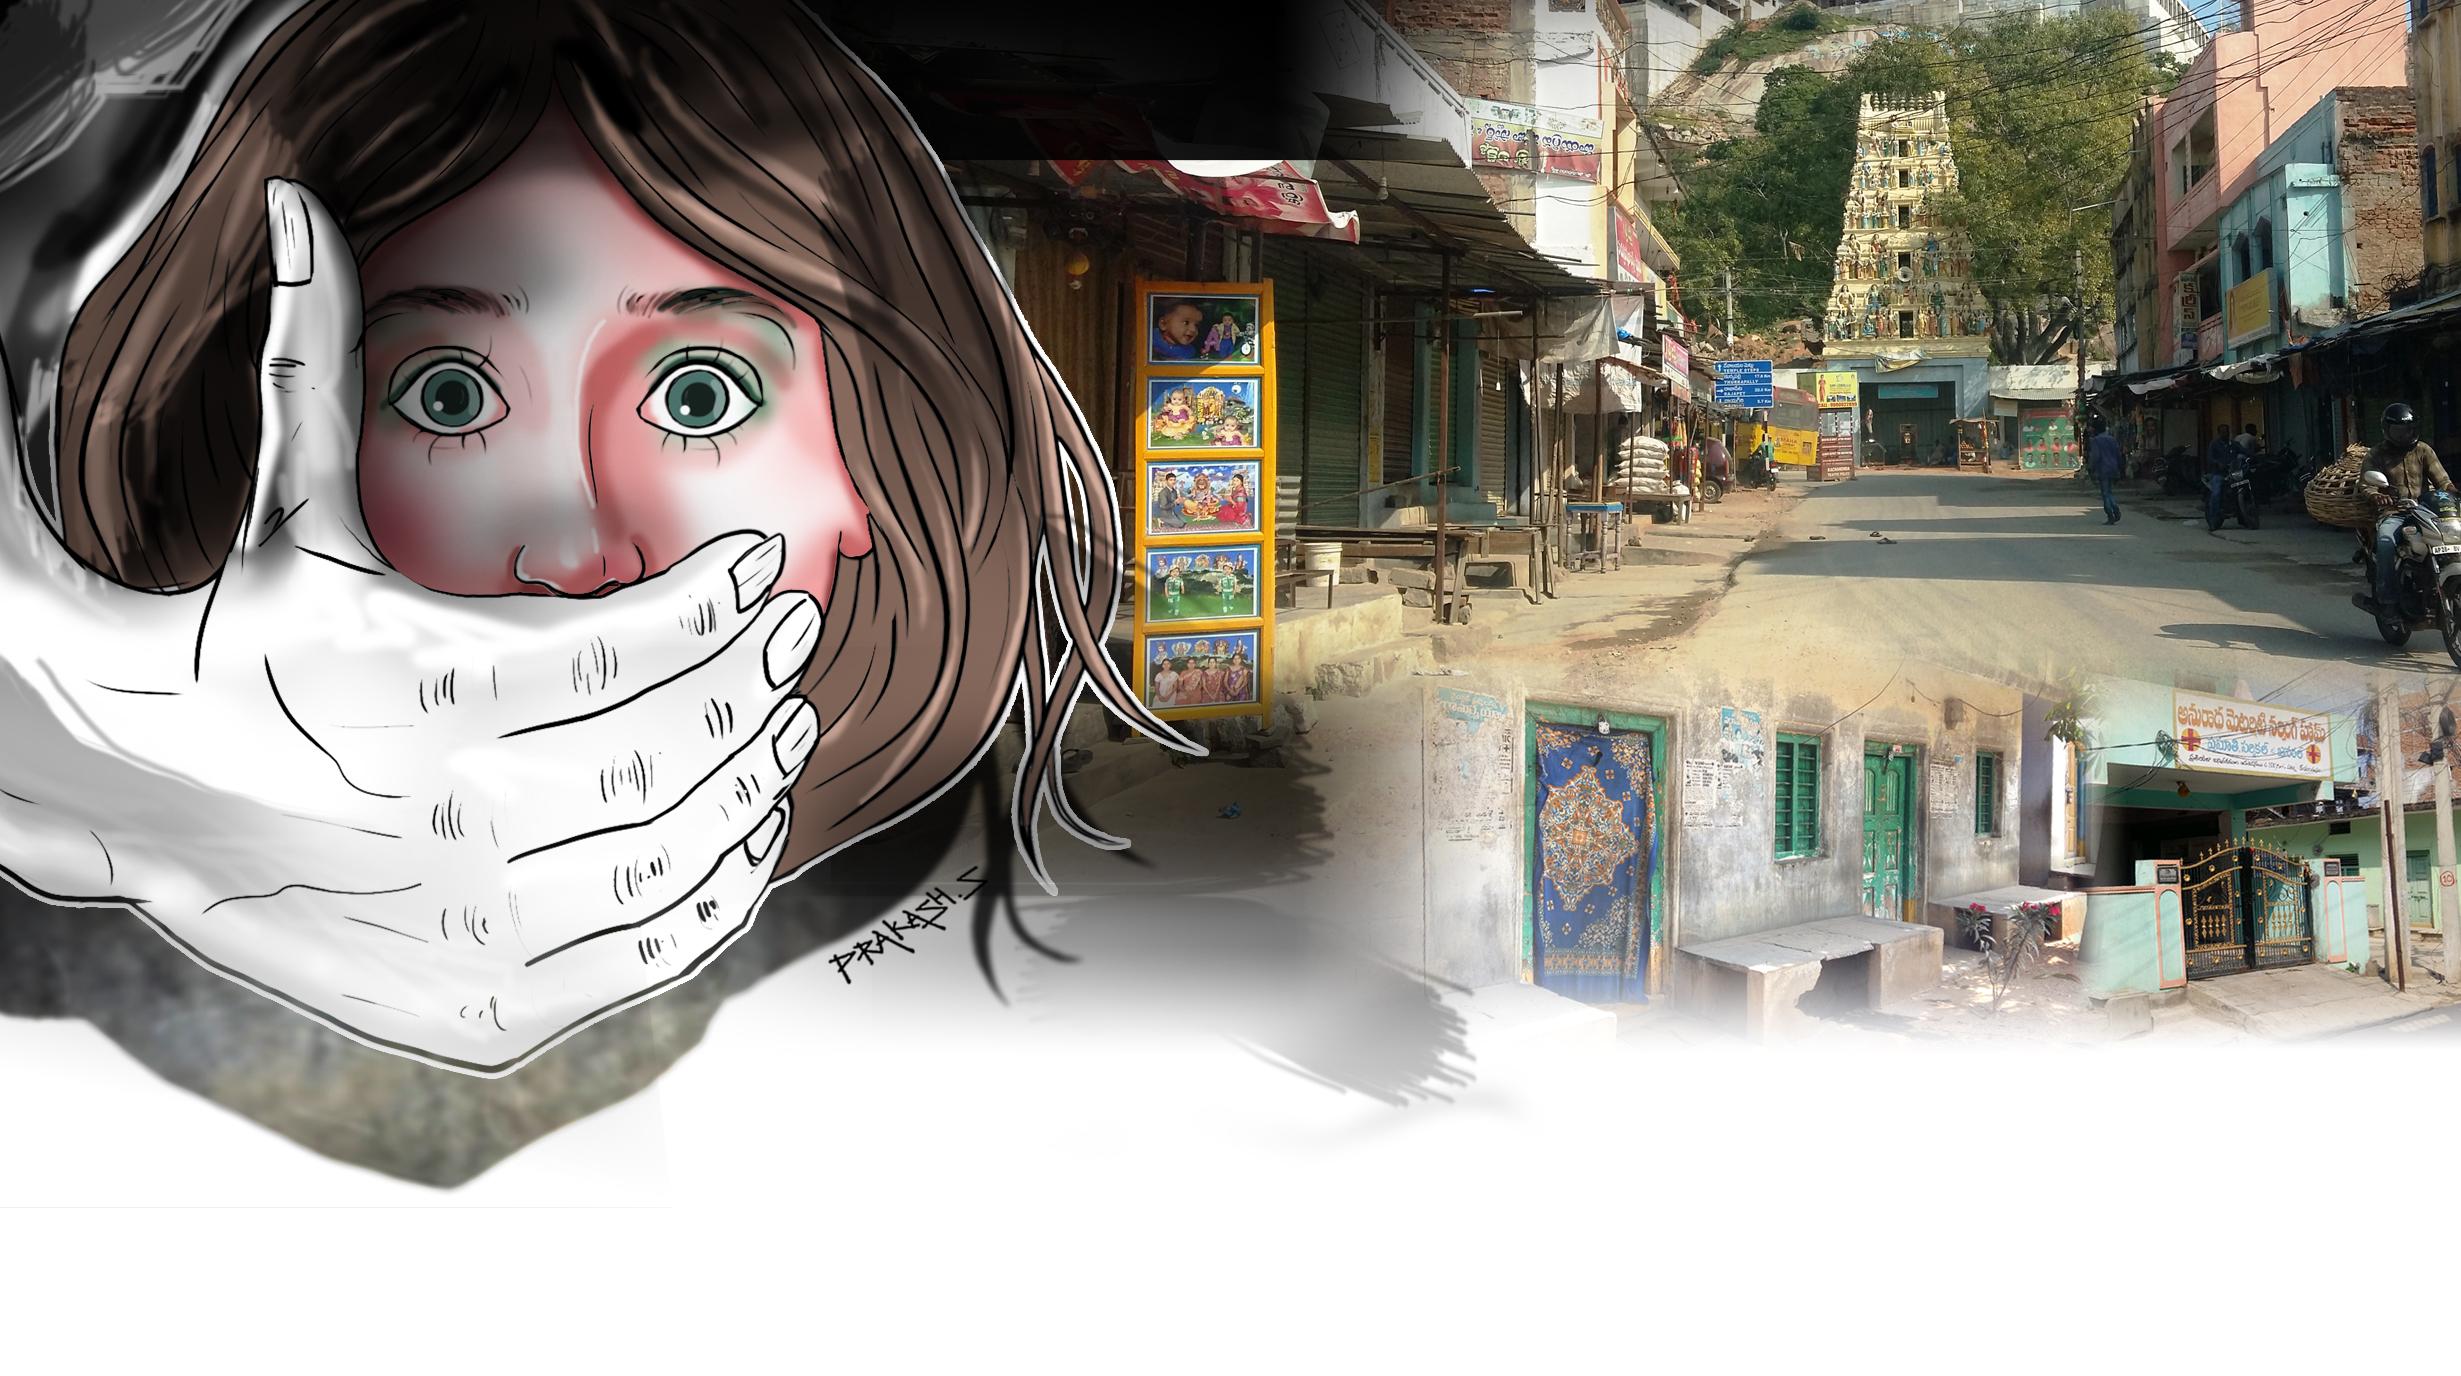 Raids have exposed Yadadri as hub of child trafficking